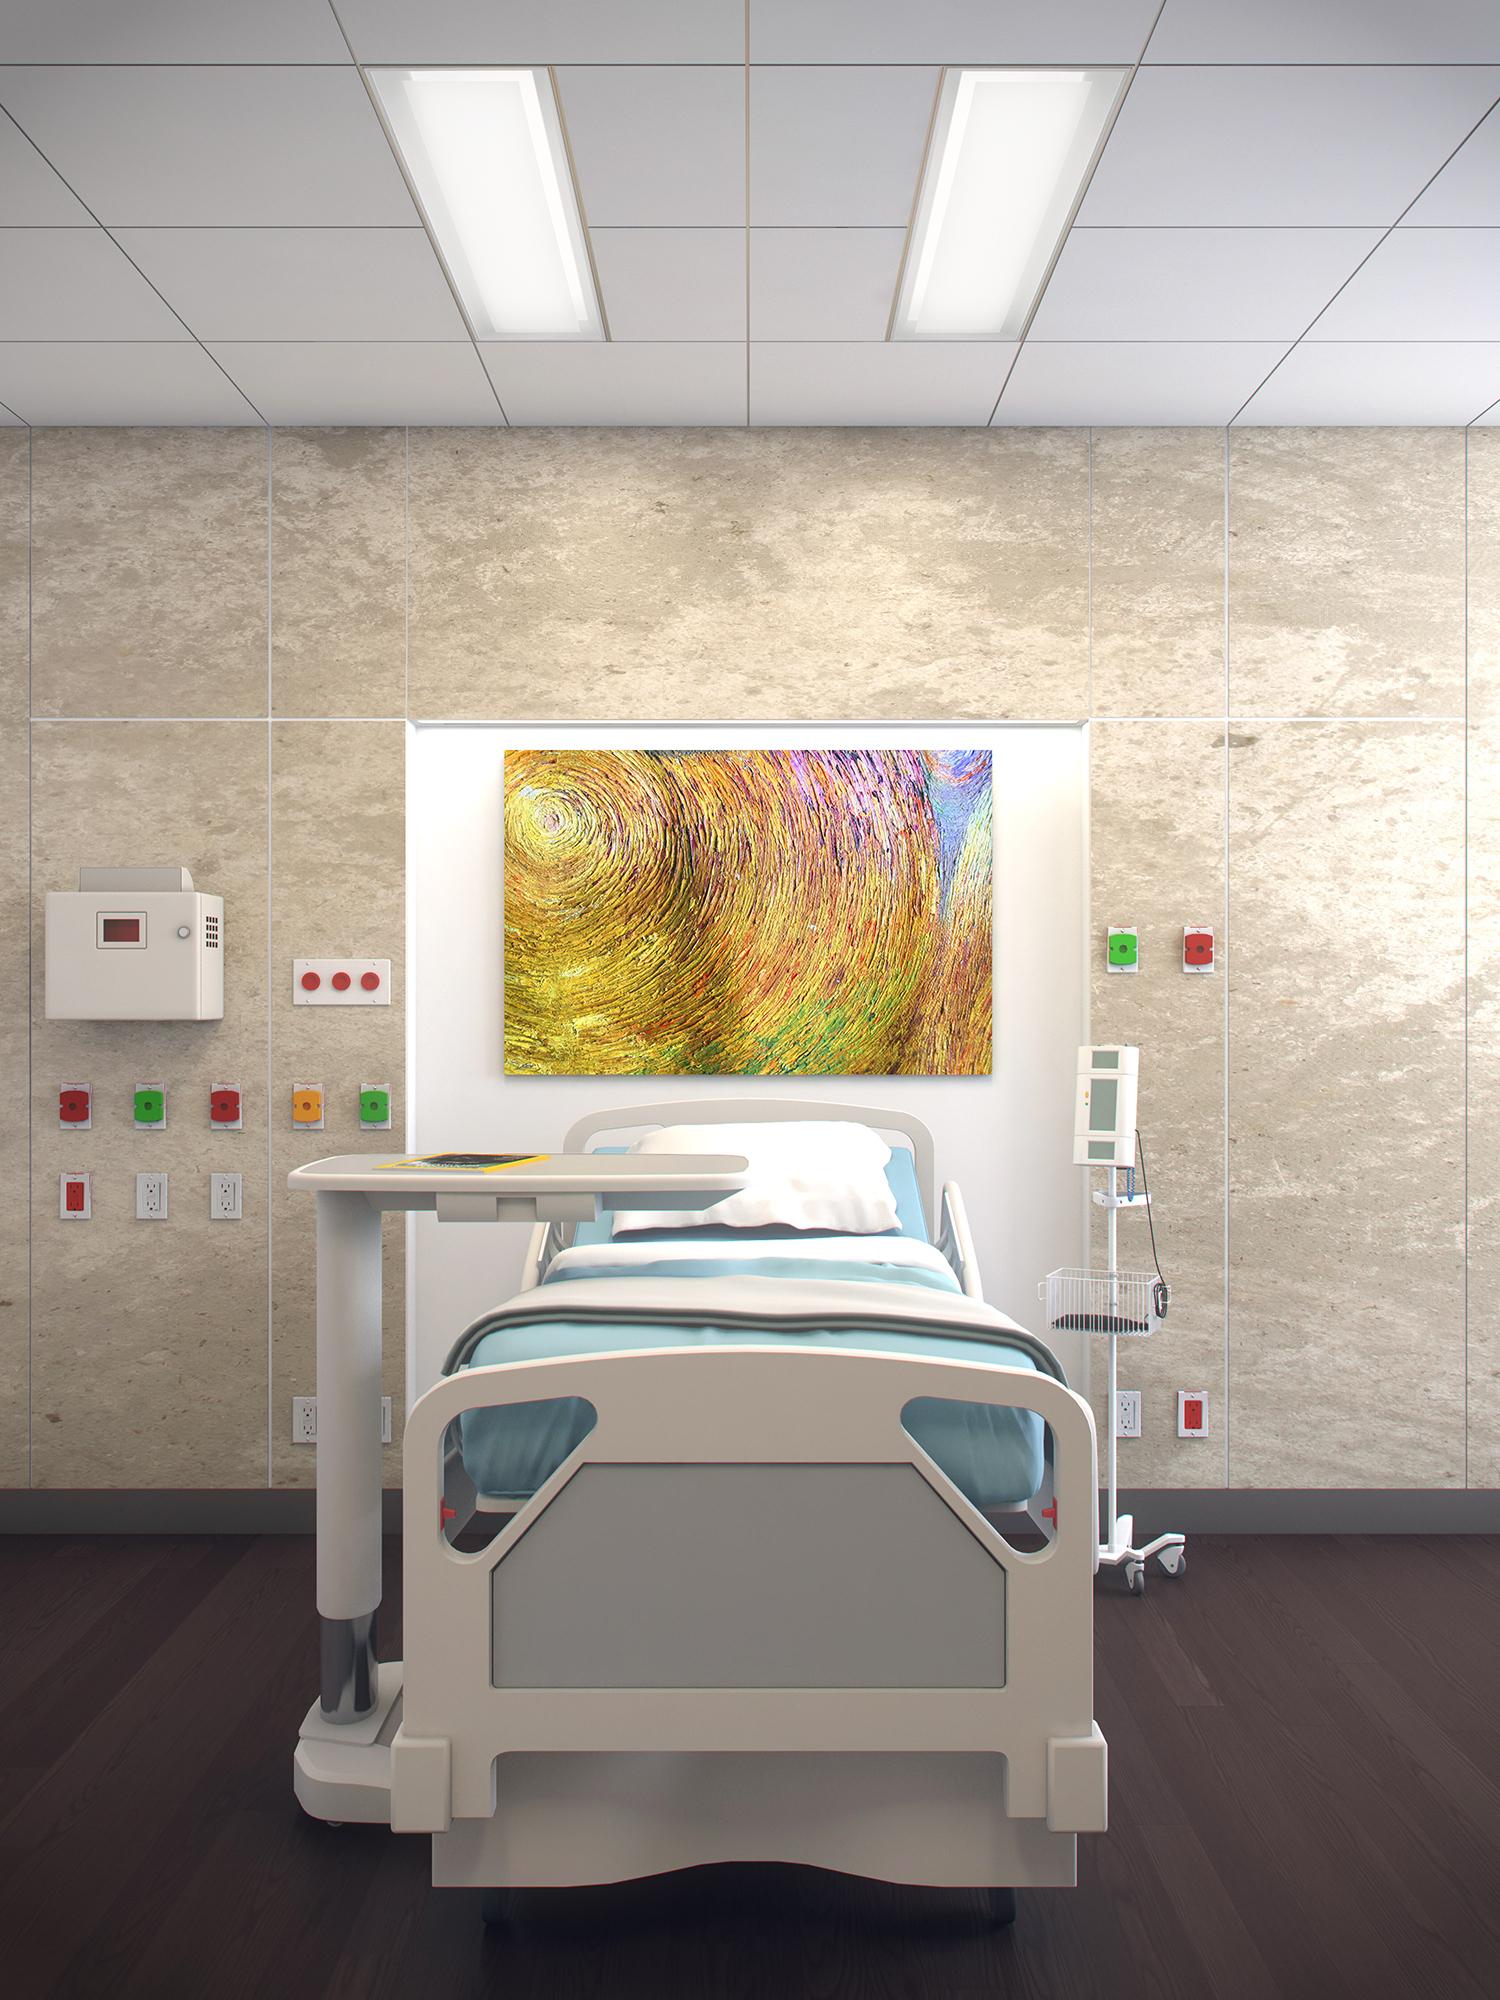 Zephyr_Hospital.jpg